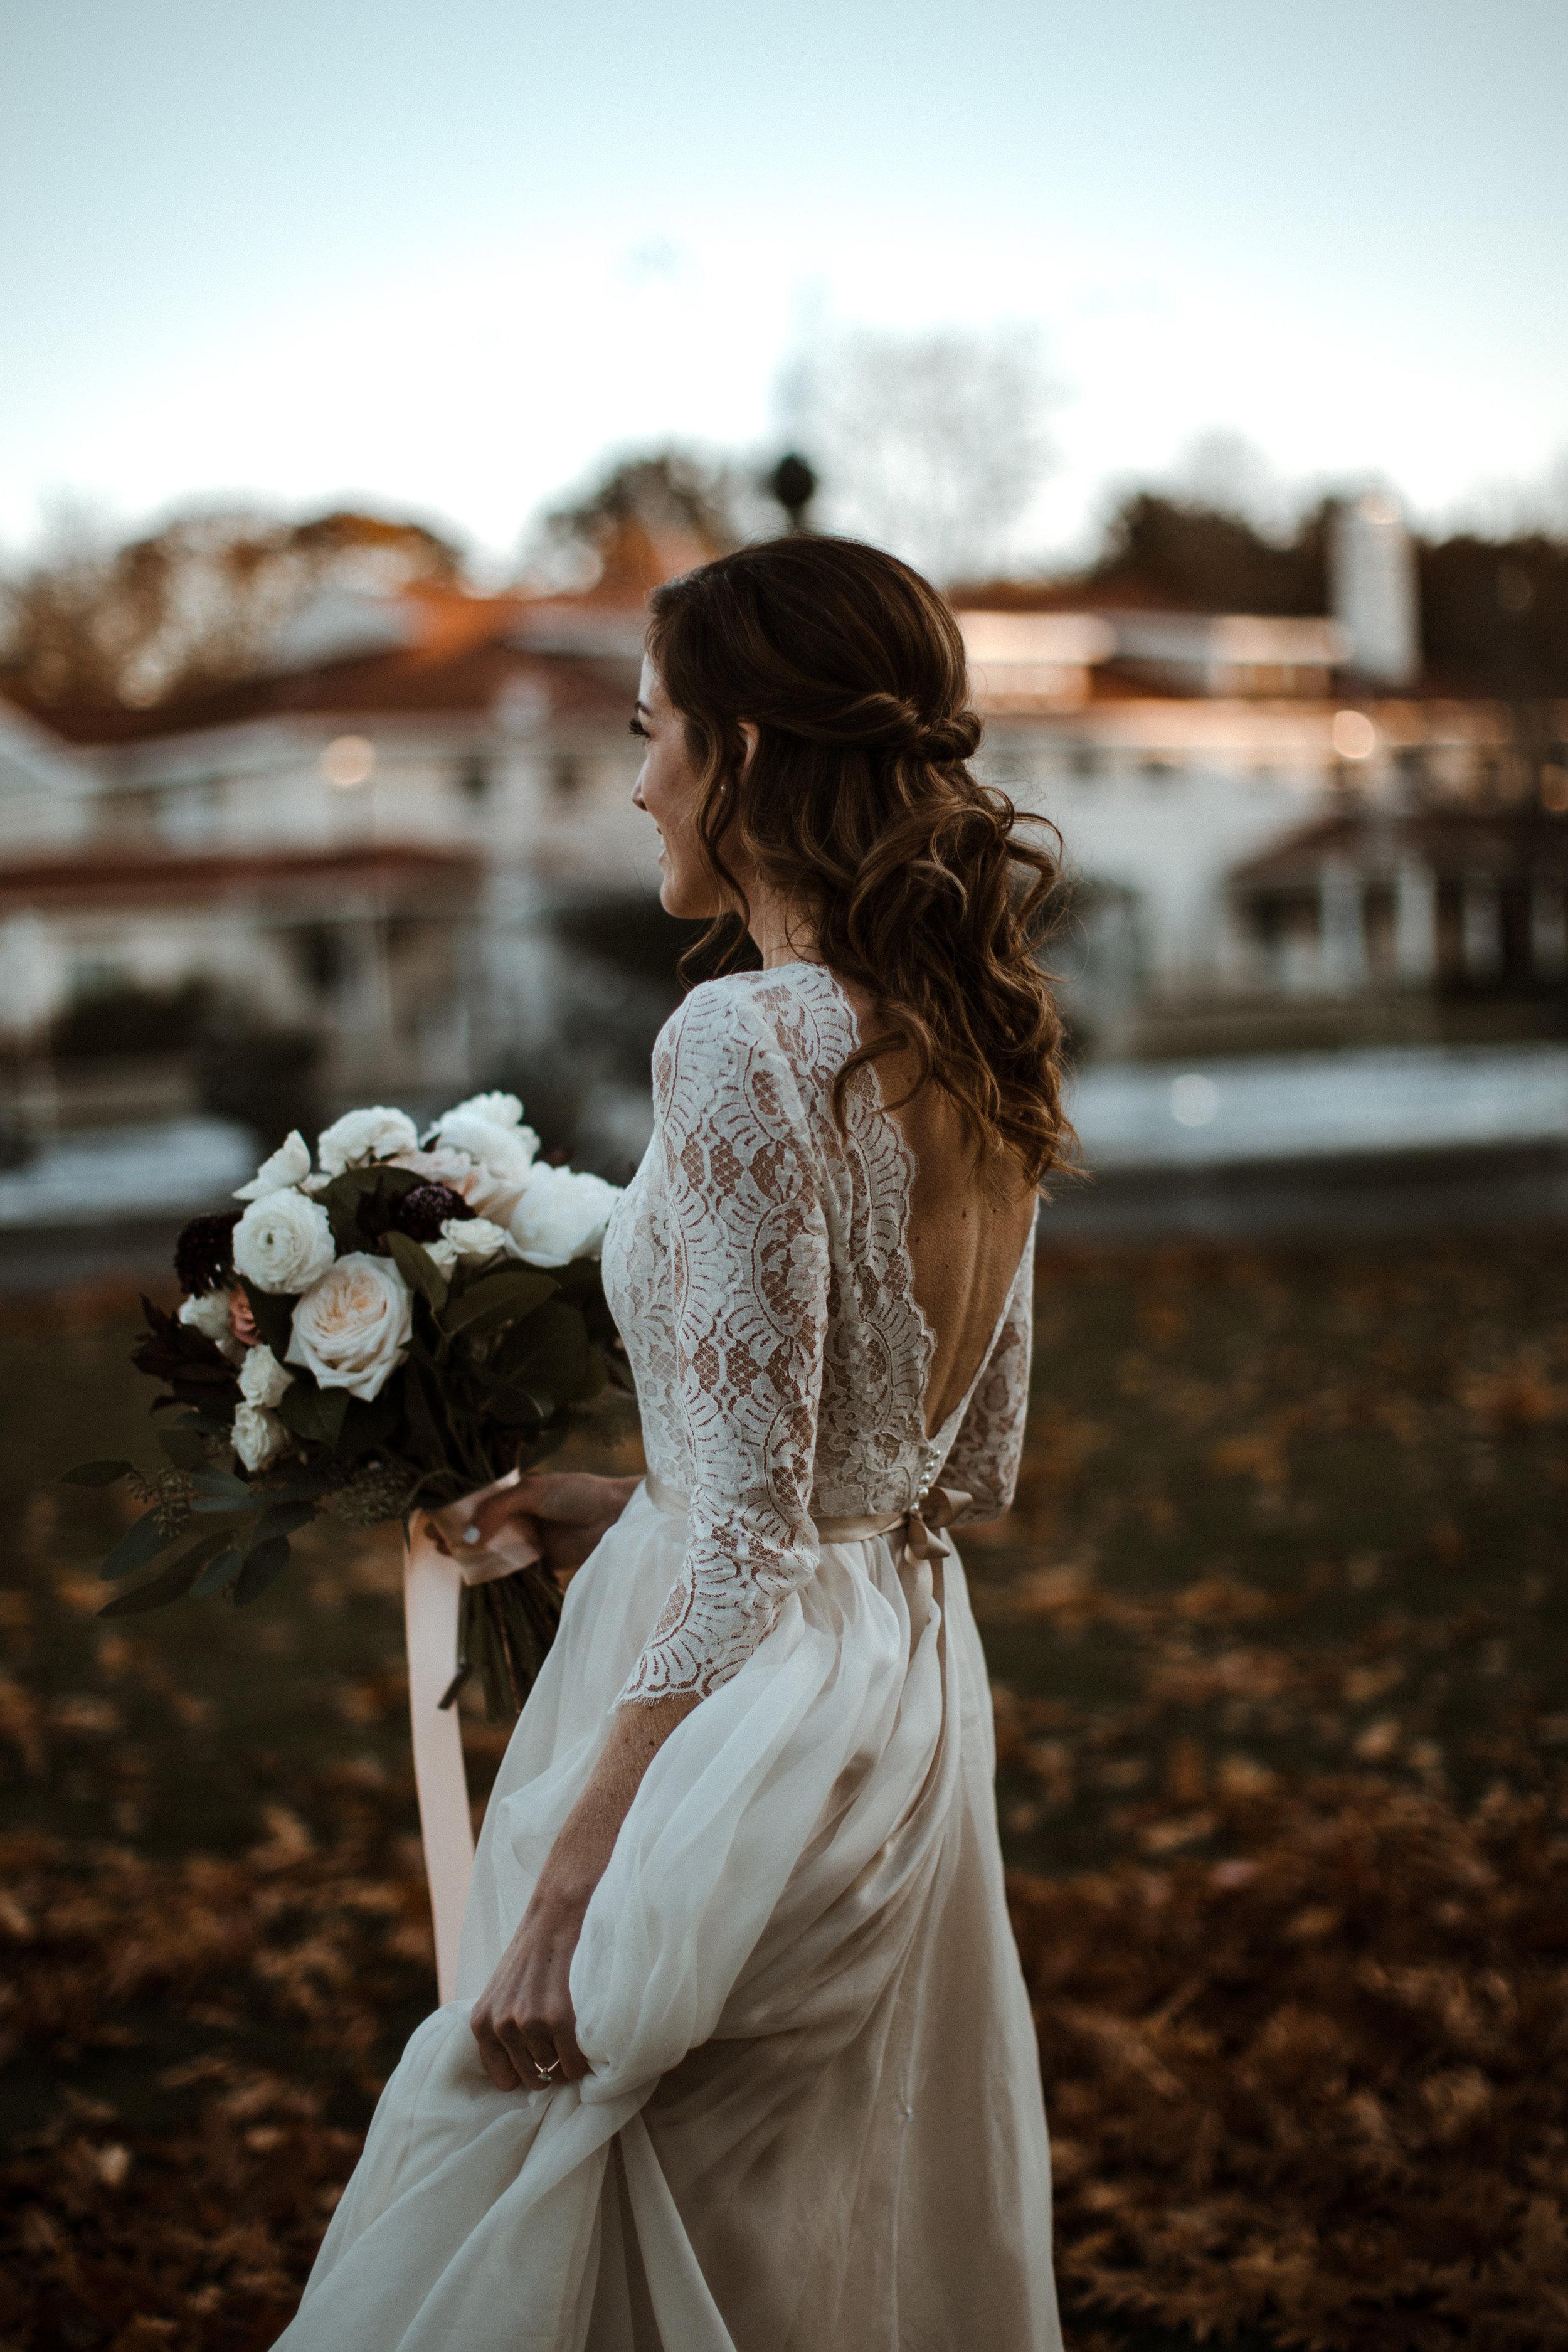 beverly_ma_wedding-36.jpg